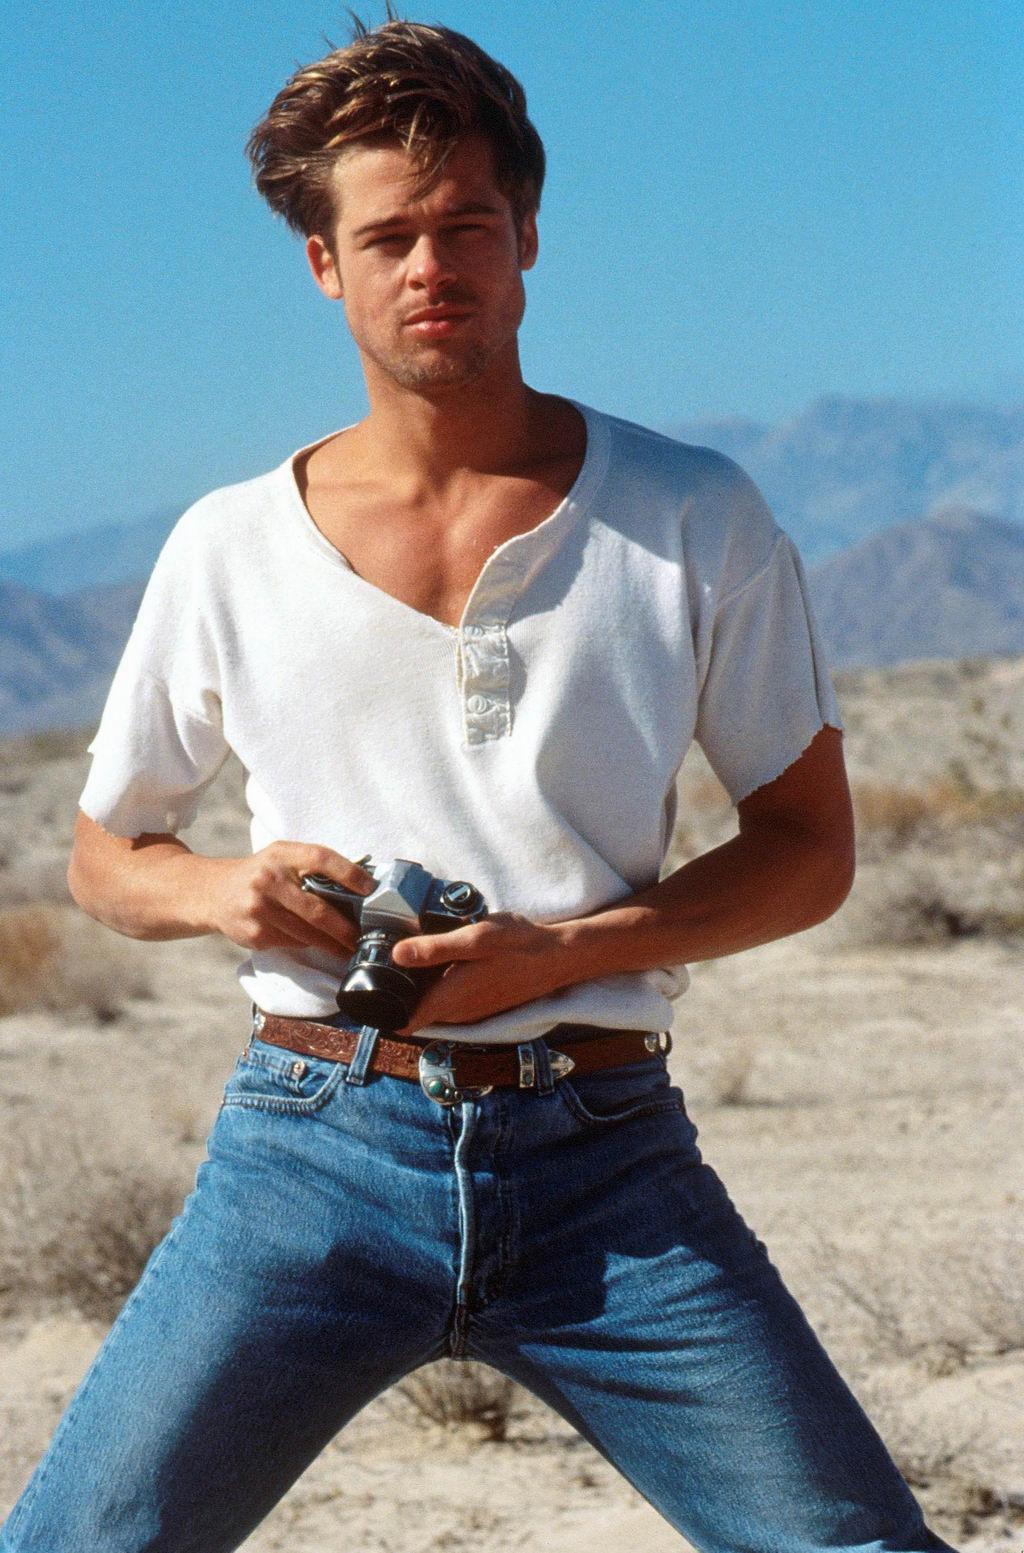 Brad Pitt Photo 525 Of 965 Pics Wallpaper Photo 387541